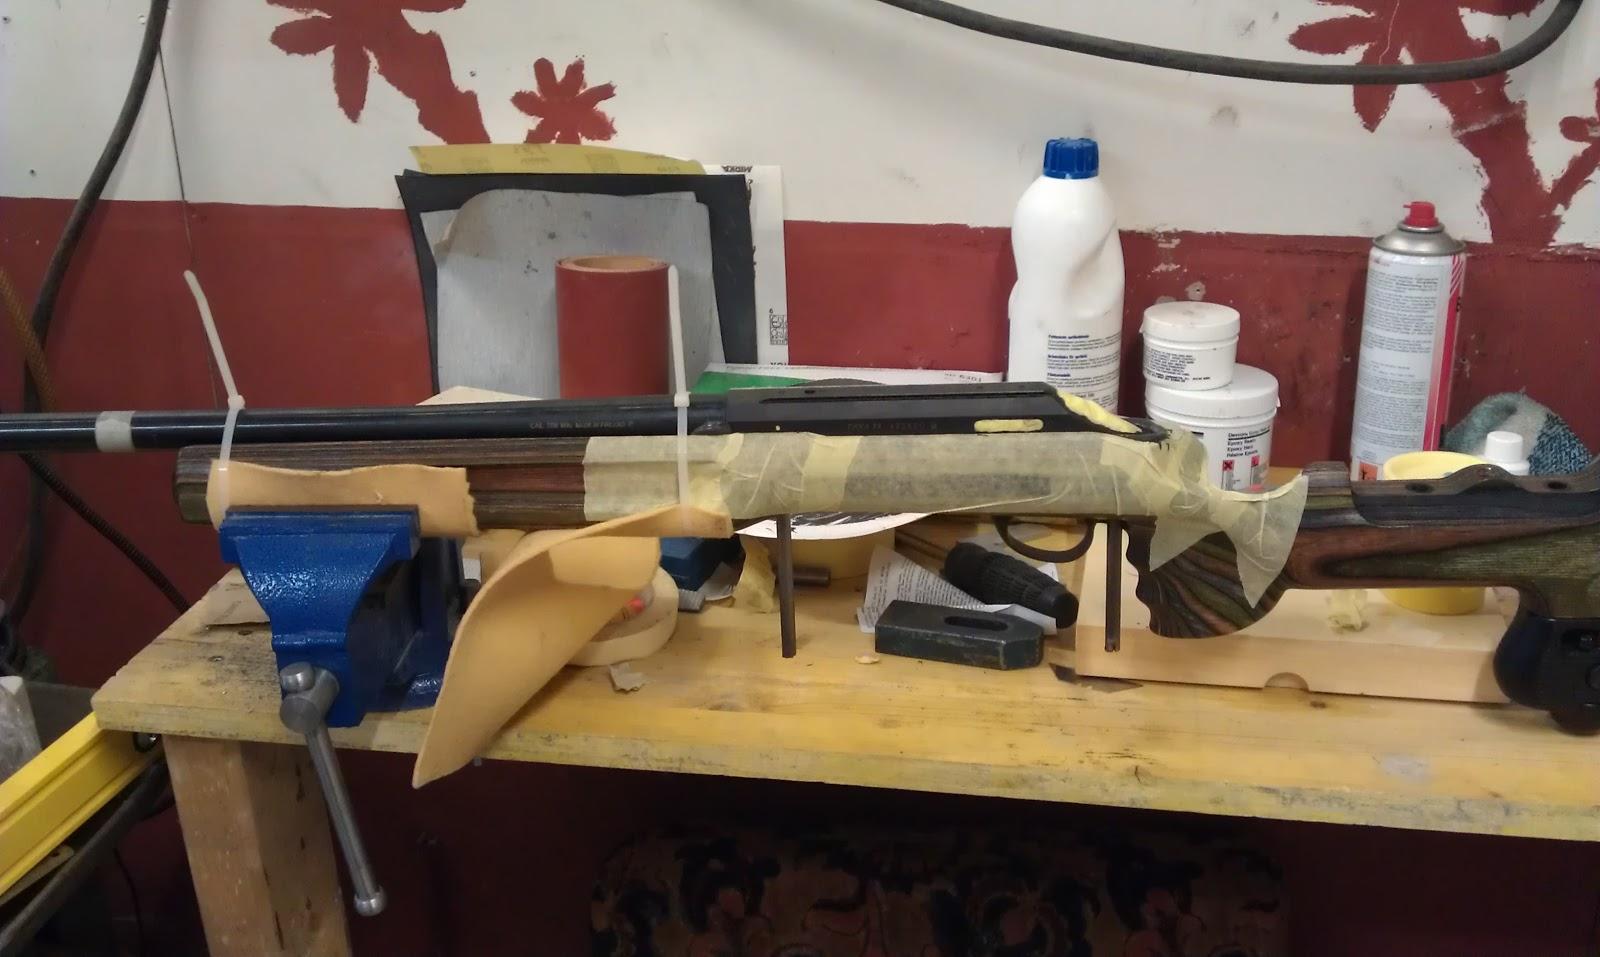 T3 Grs Recoil Lug Adventures Ruistola